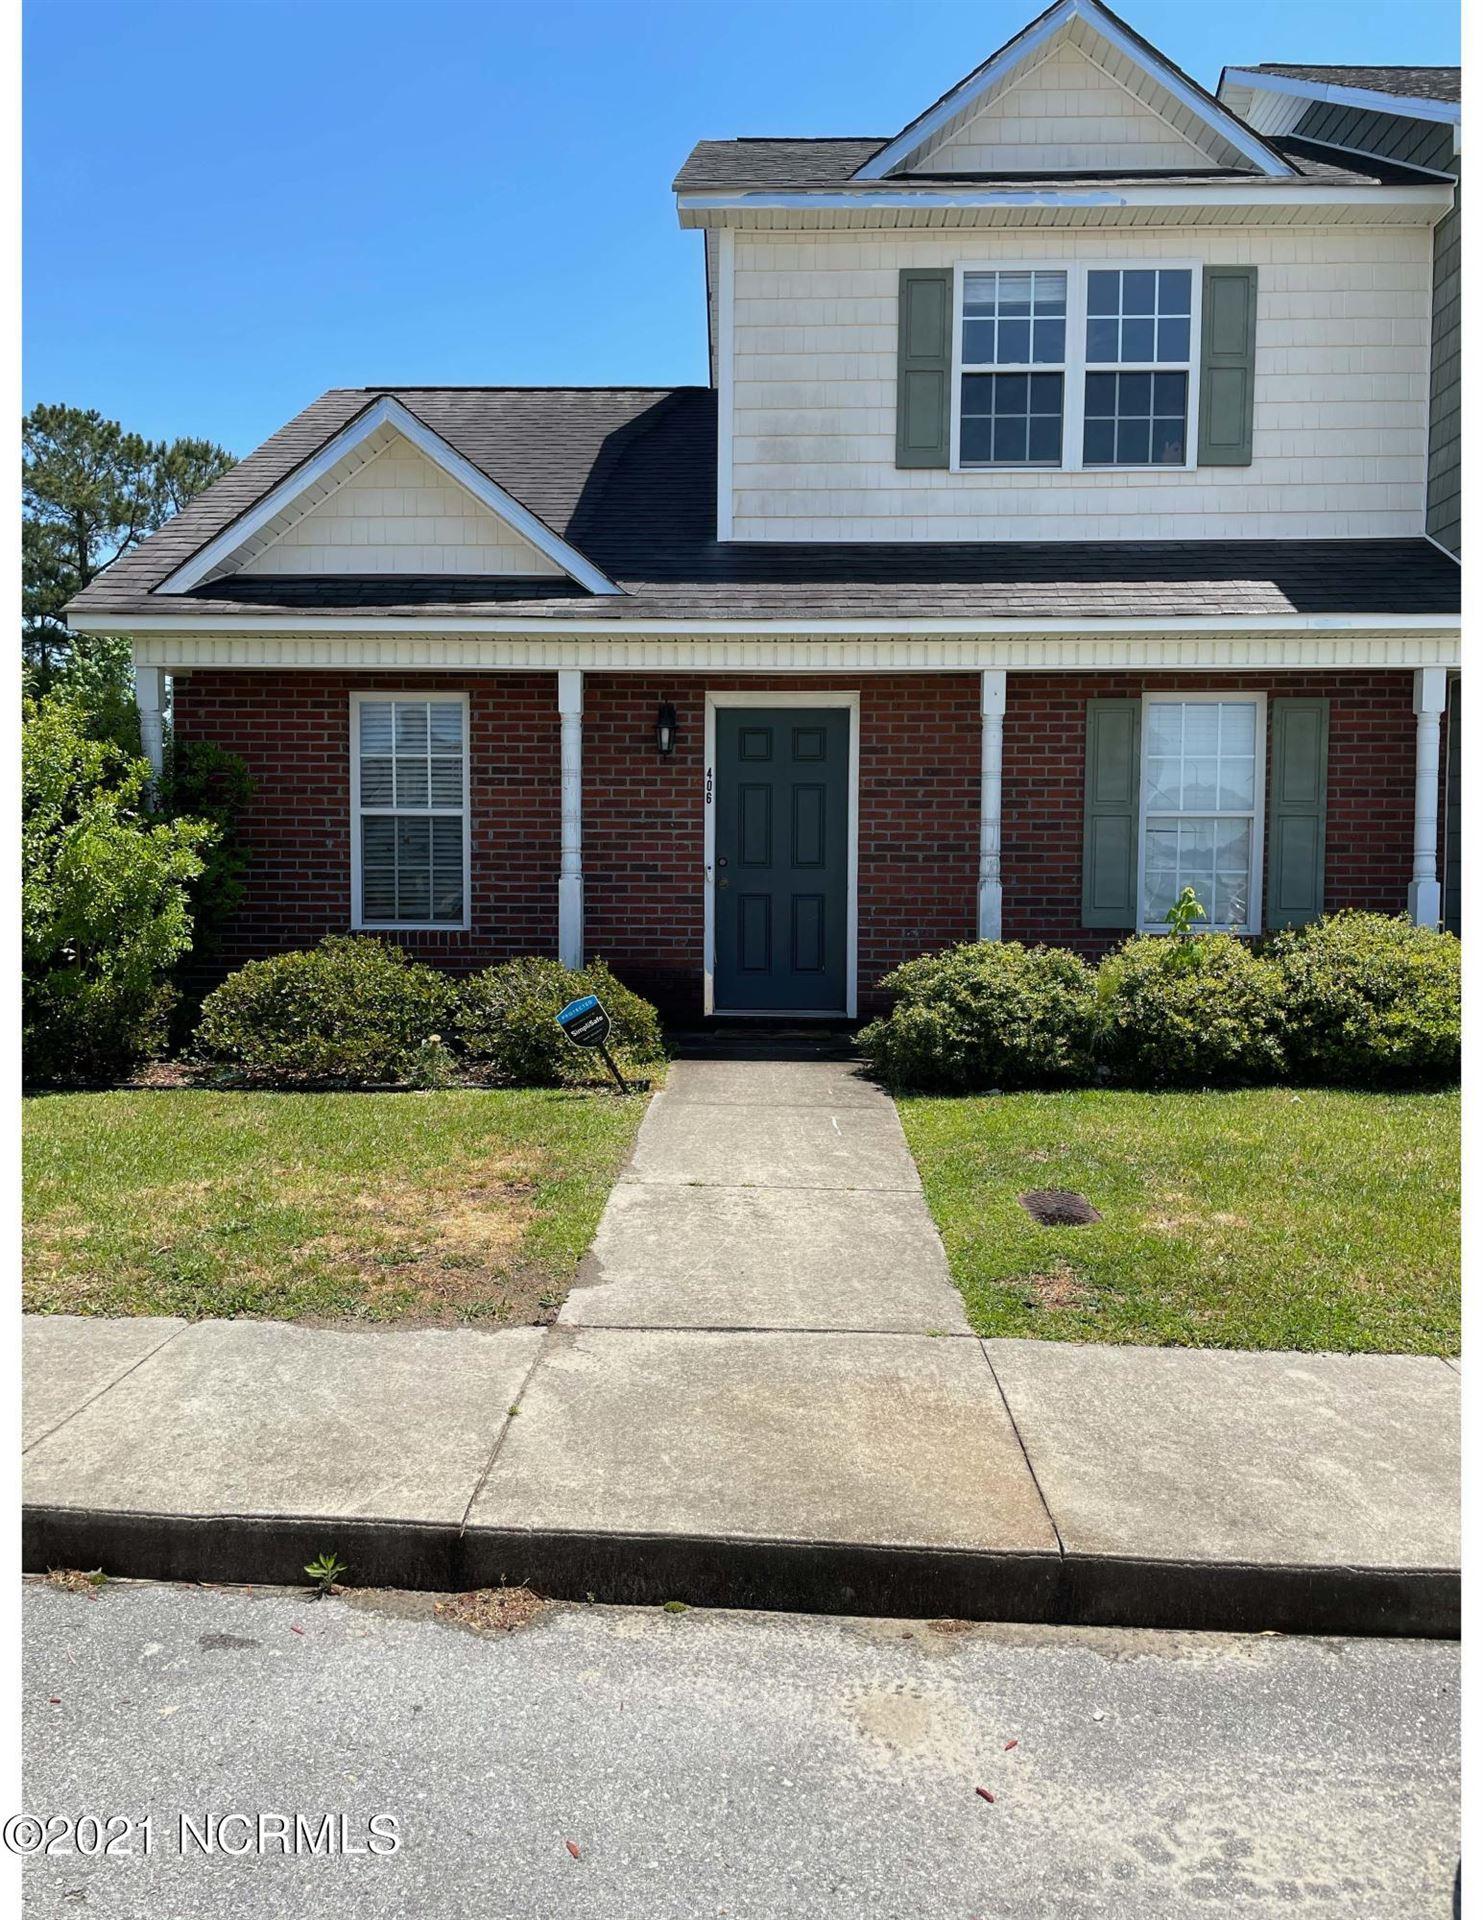 Photo of 406 Streamwood Drive, Jacksonville, NC 28546 (MLS # 100273242)